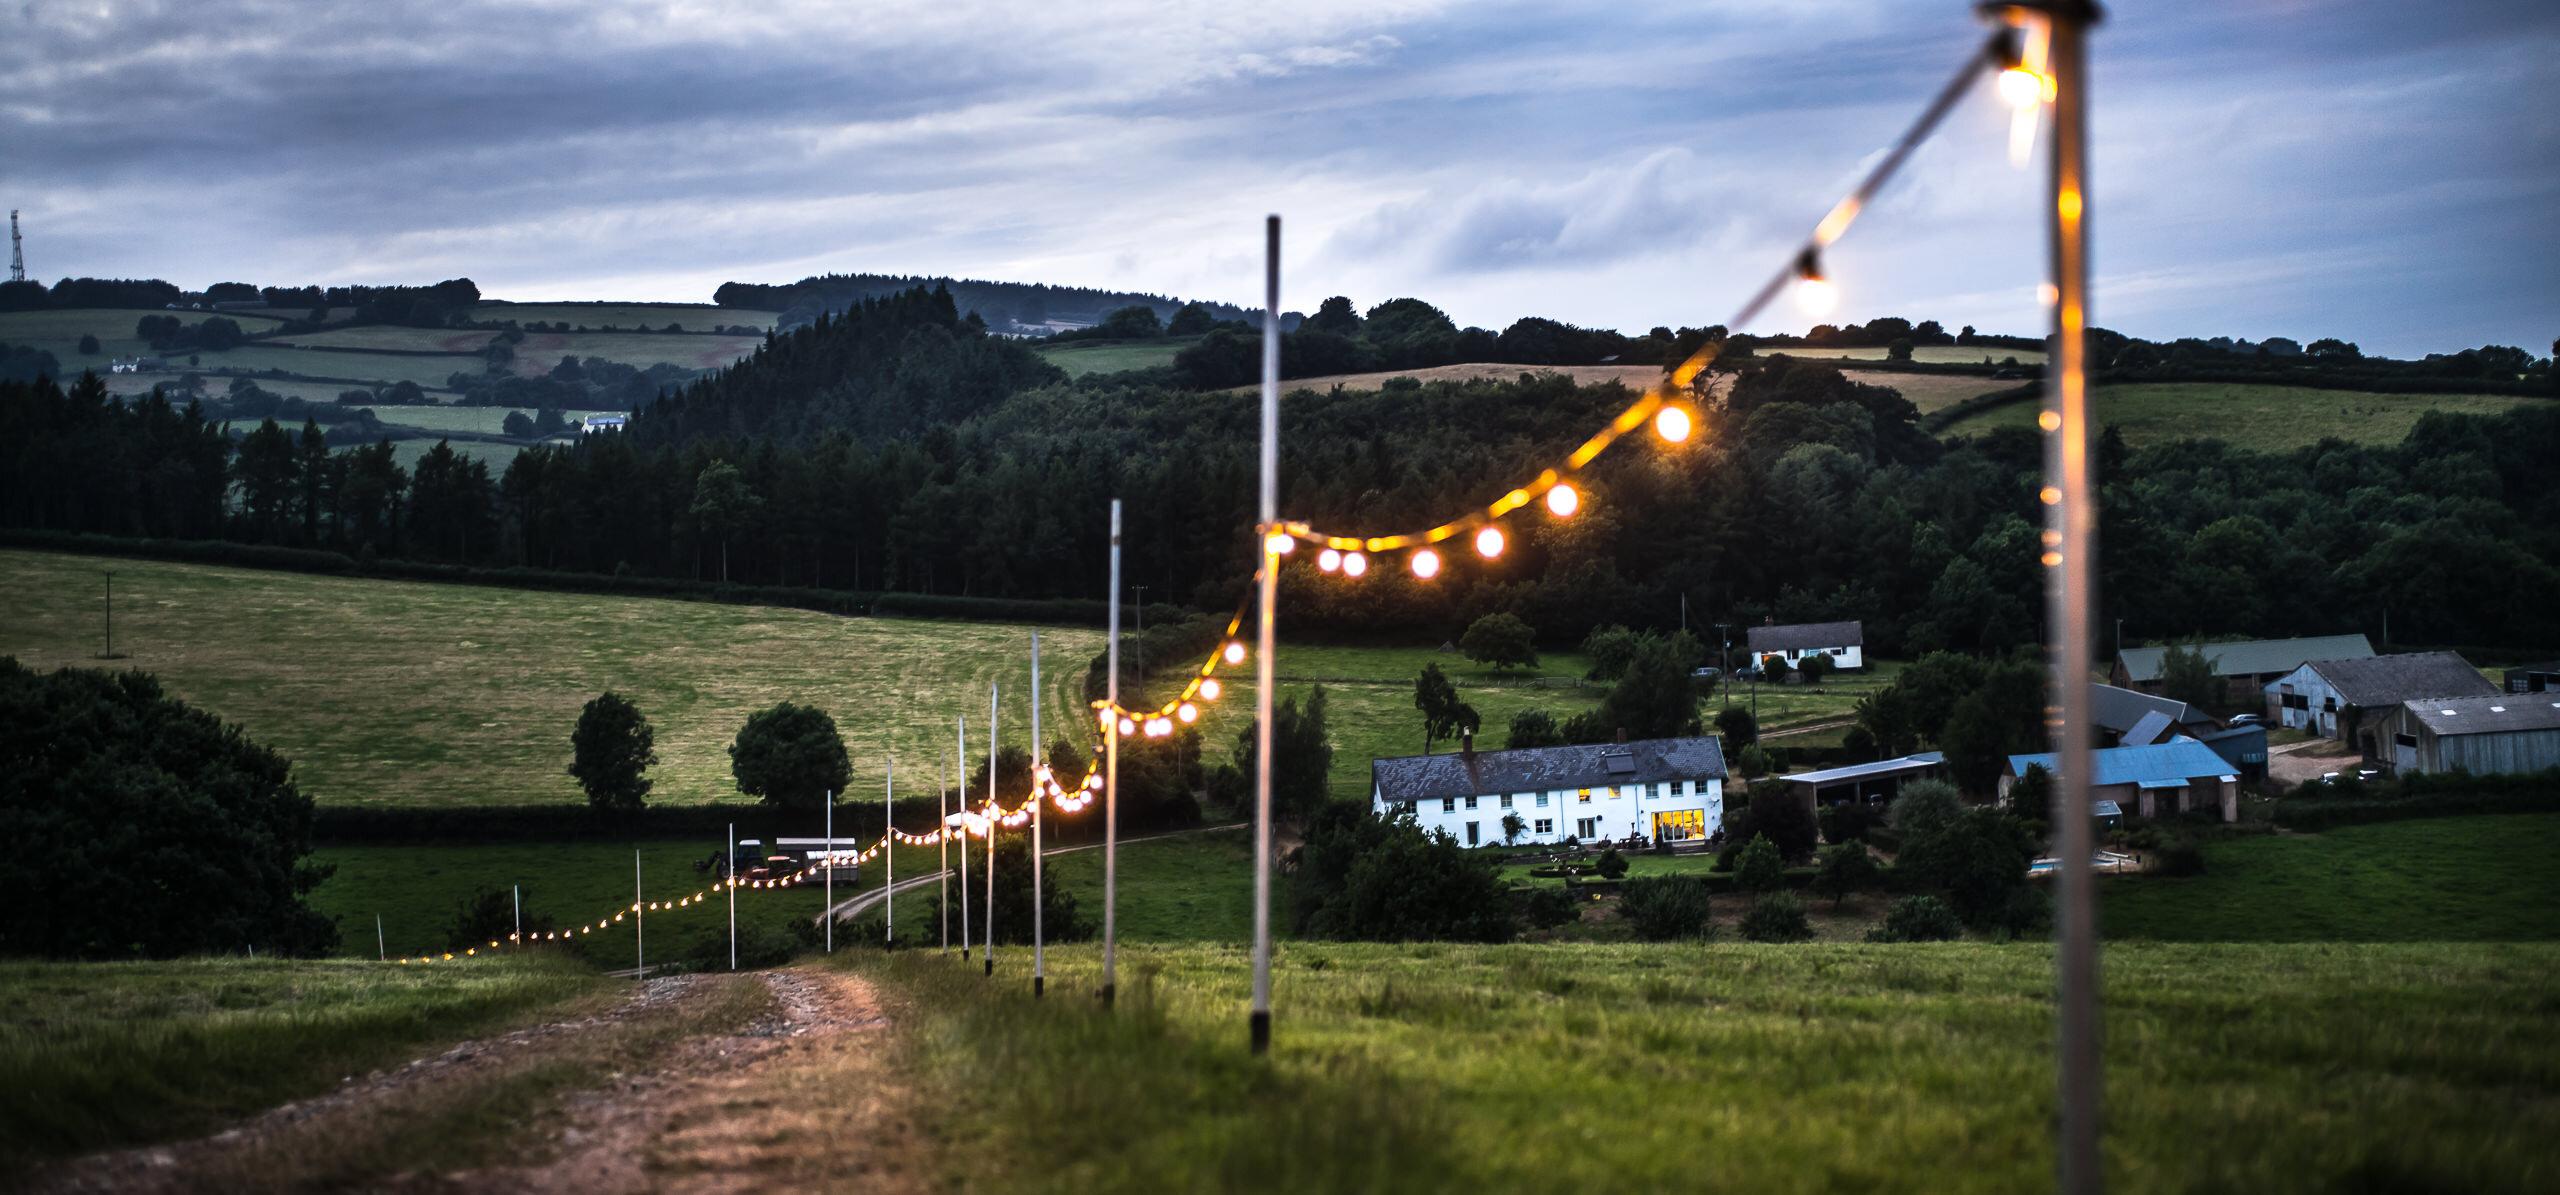 Wedding Gallery On The Farm By Brett Leica Photographer 09